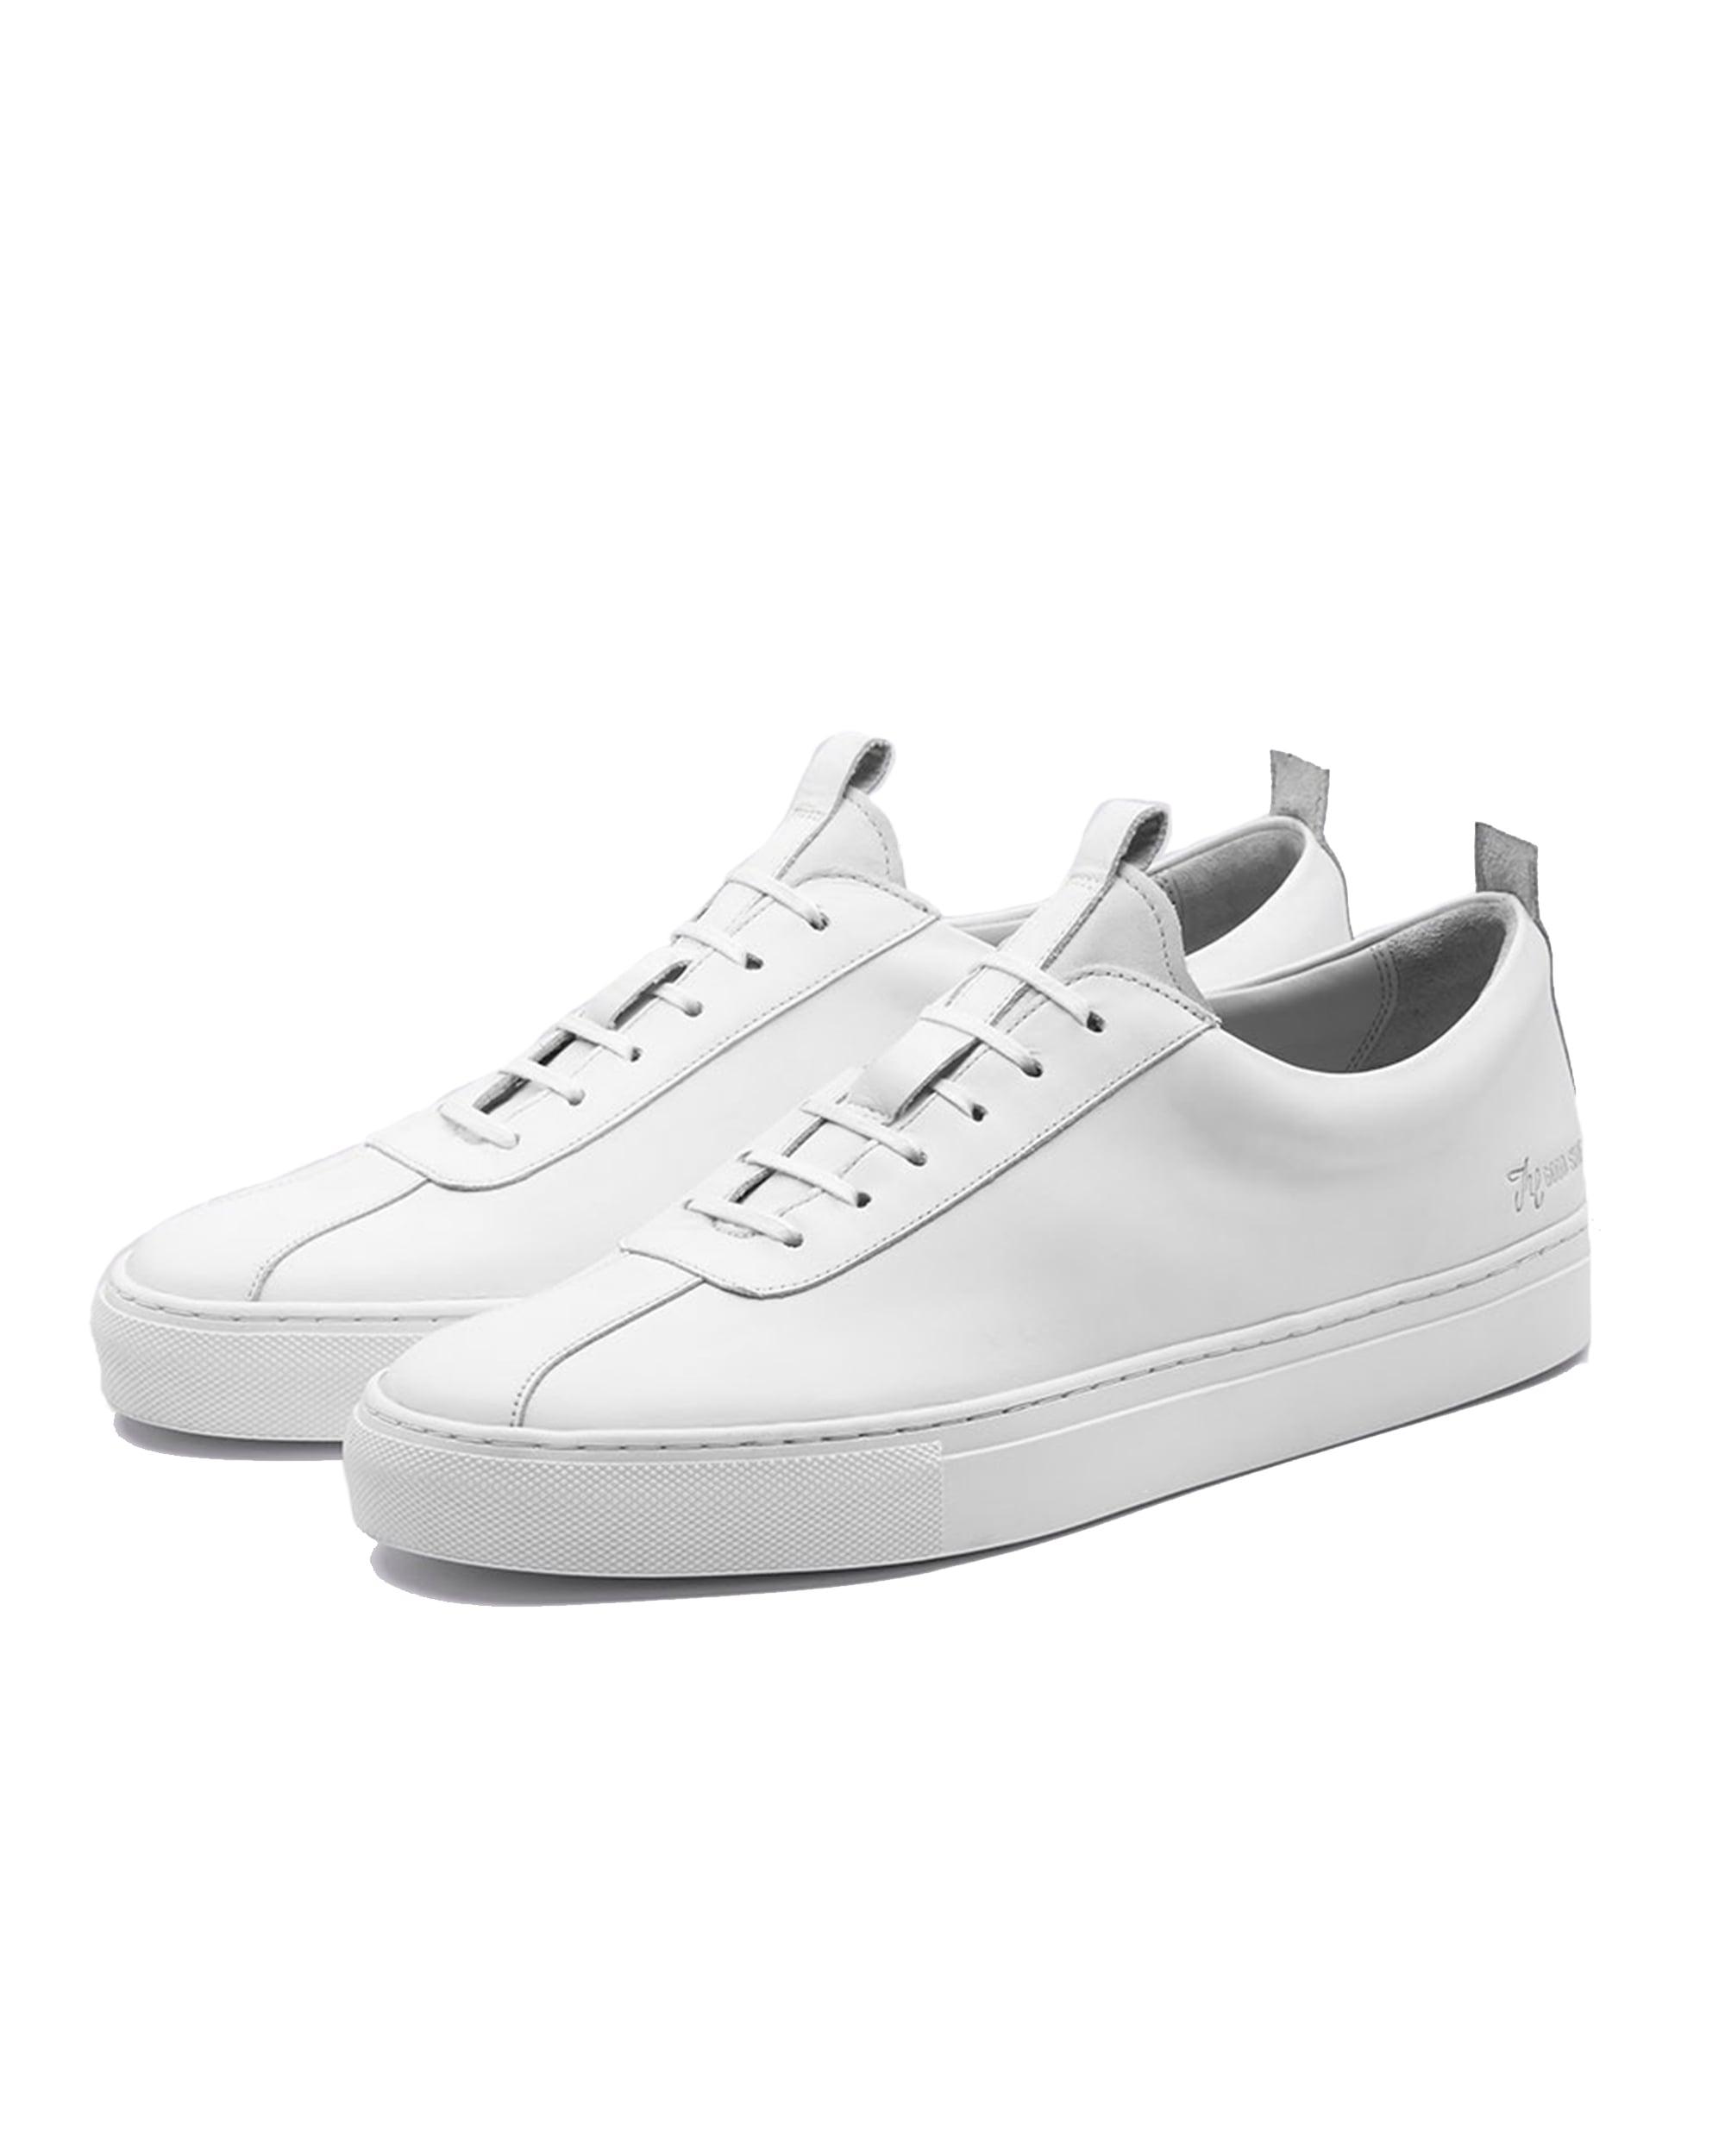 White Calf Leather Hi Top Sneakers Grenson 851yOlgl